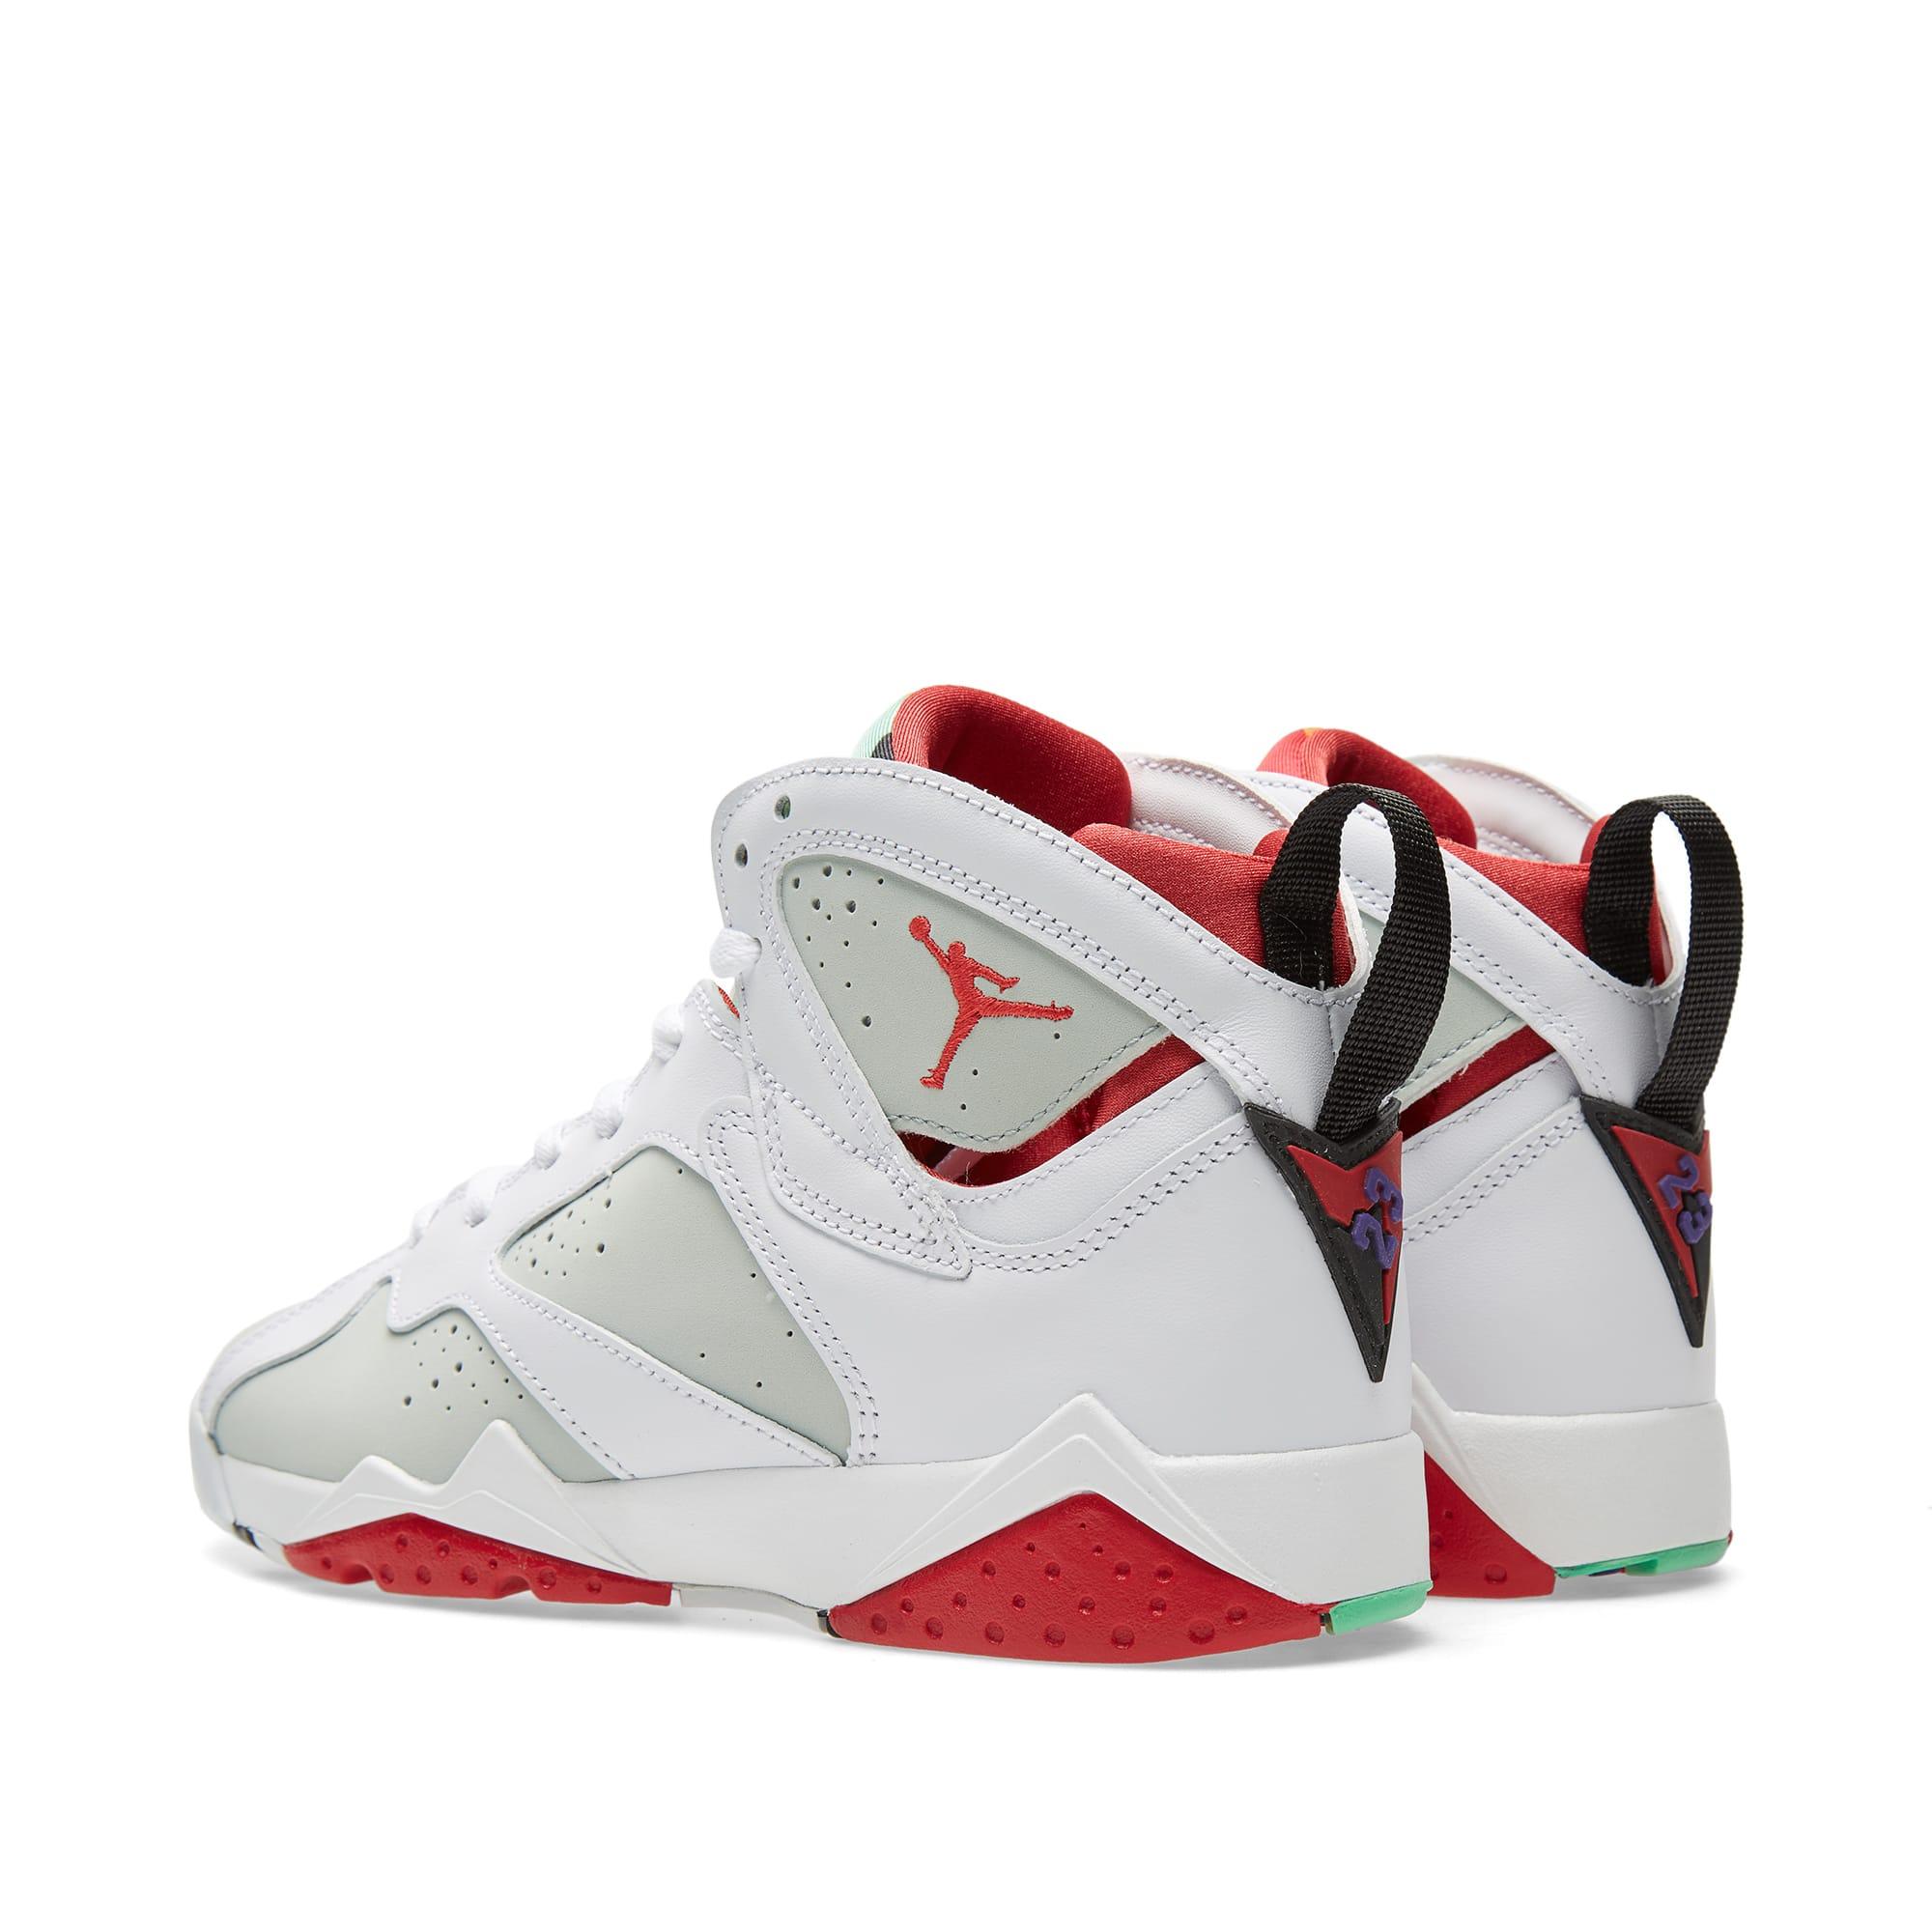 on sale ab3f4 81f26 Nike Air Jordan VII Retro BG  Hare  White, True Red   Light Silver   END.